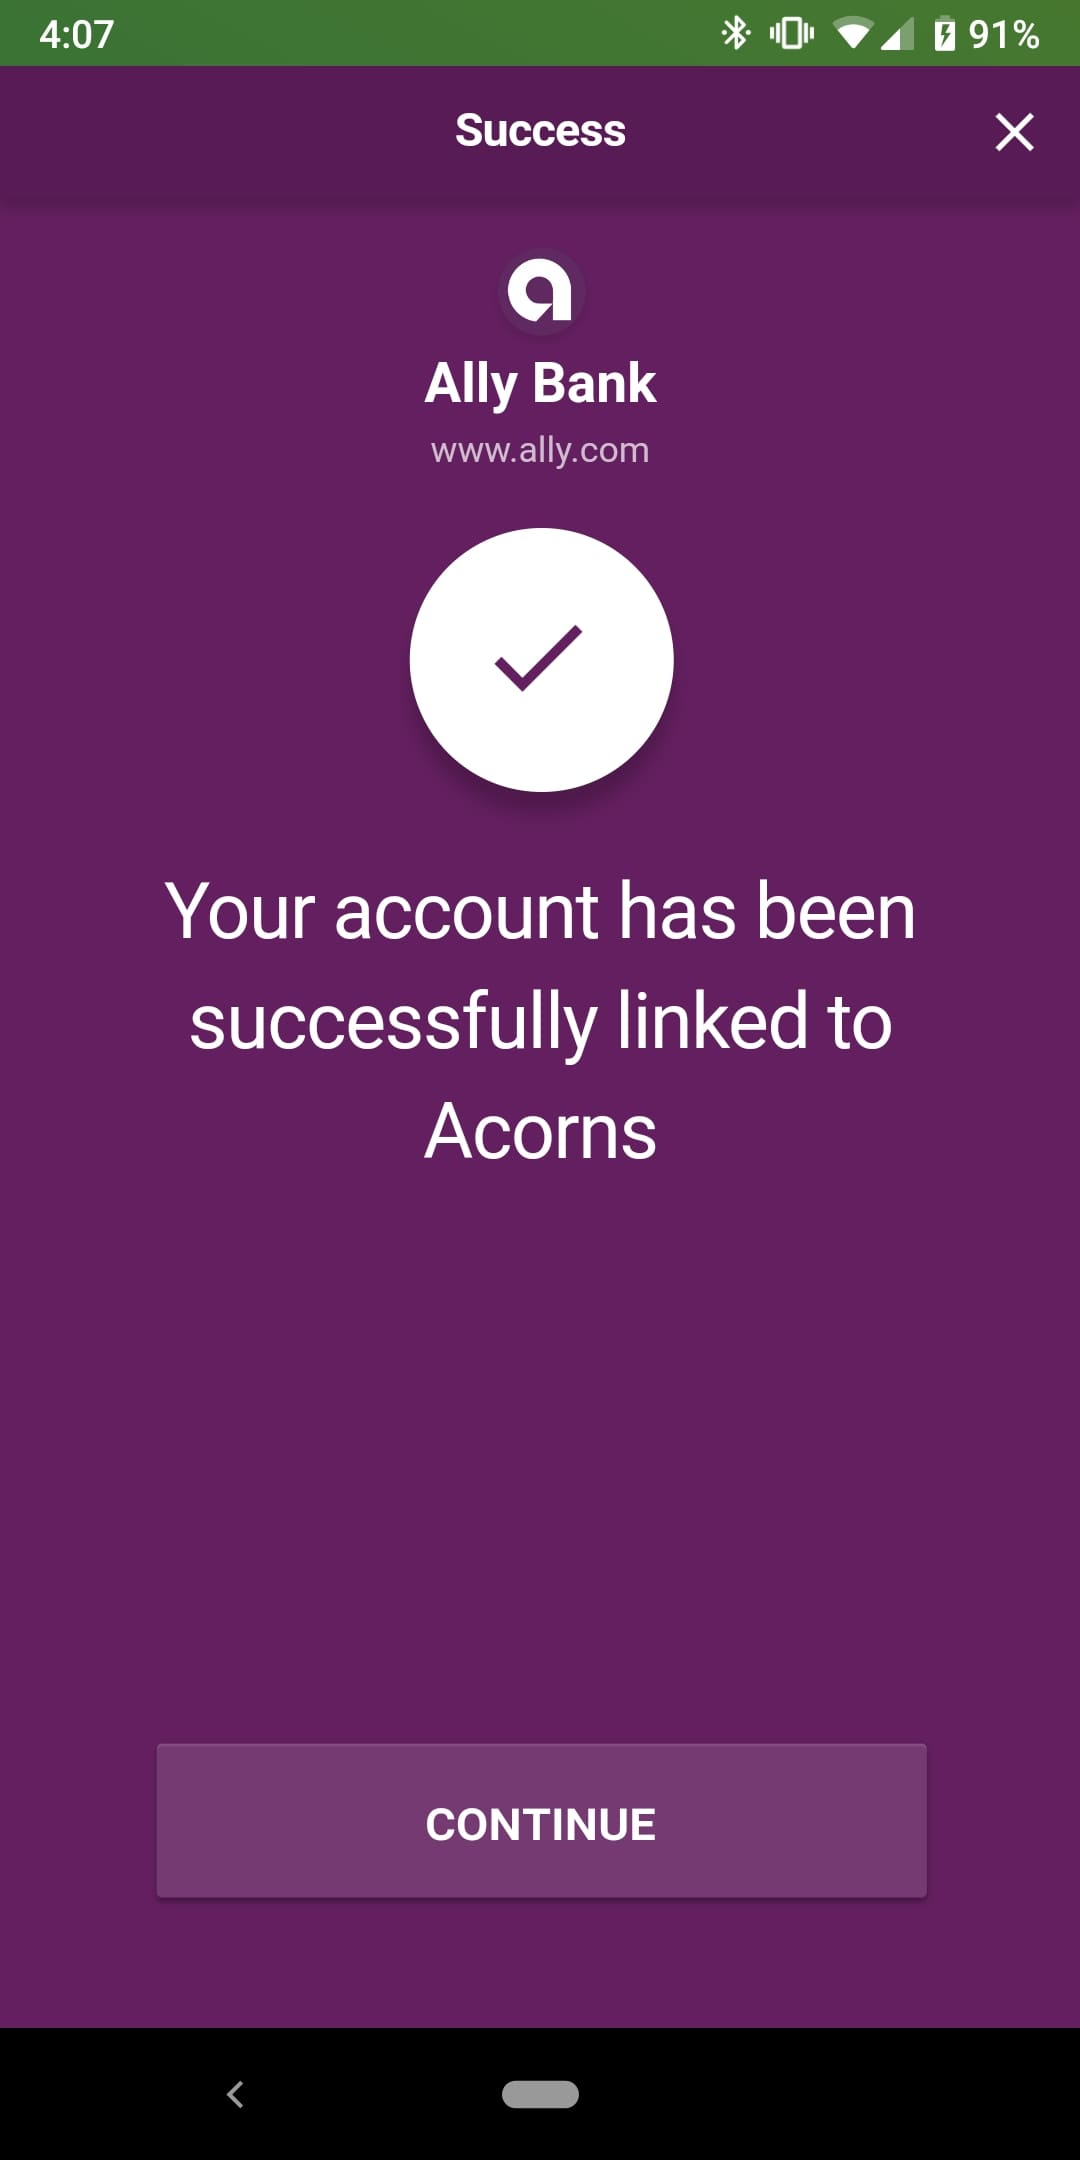 acorns mobile app linking bank account success message